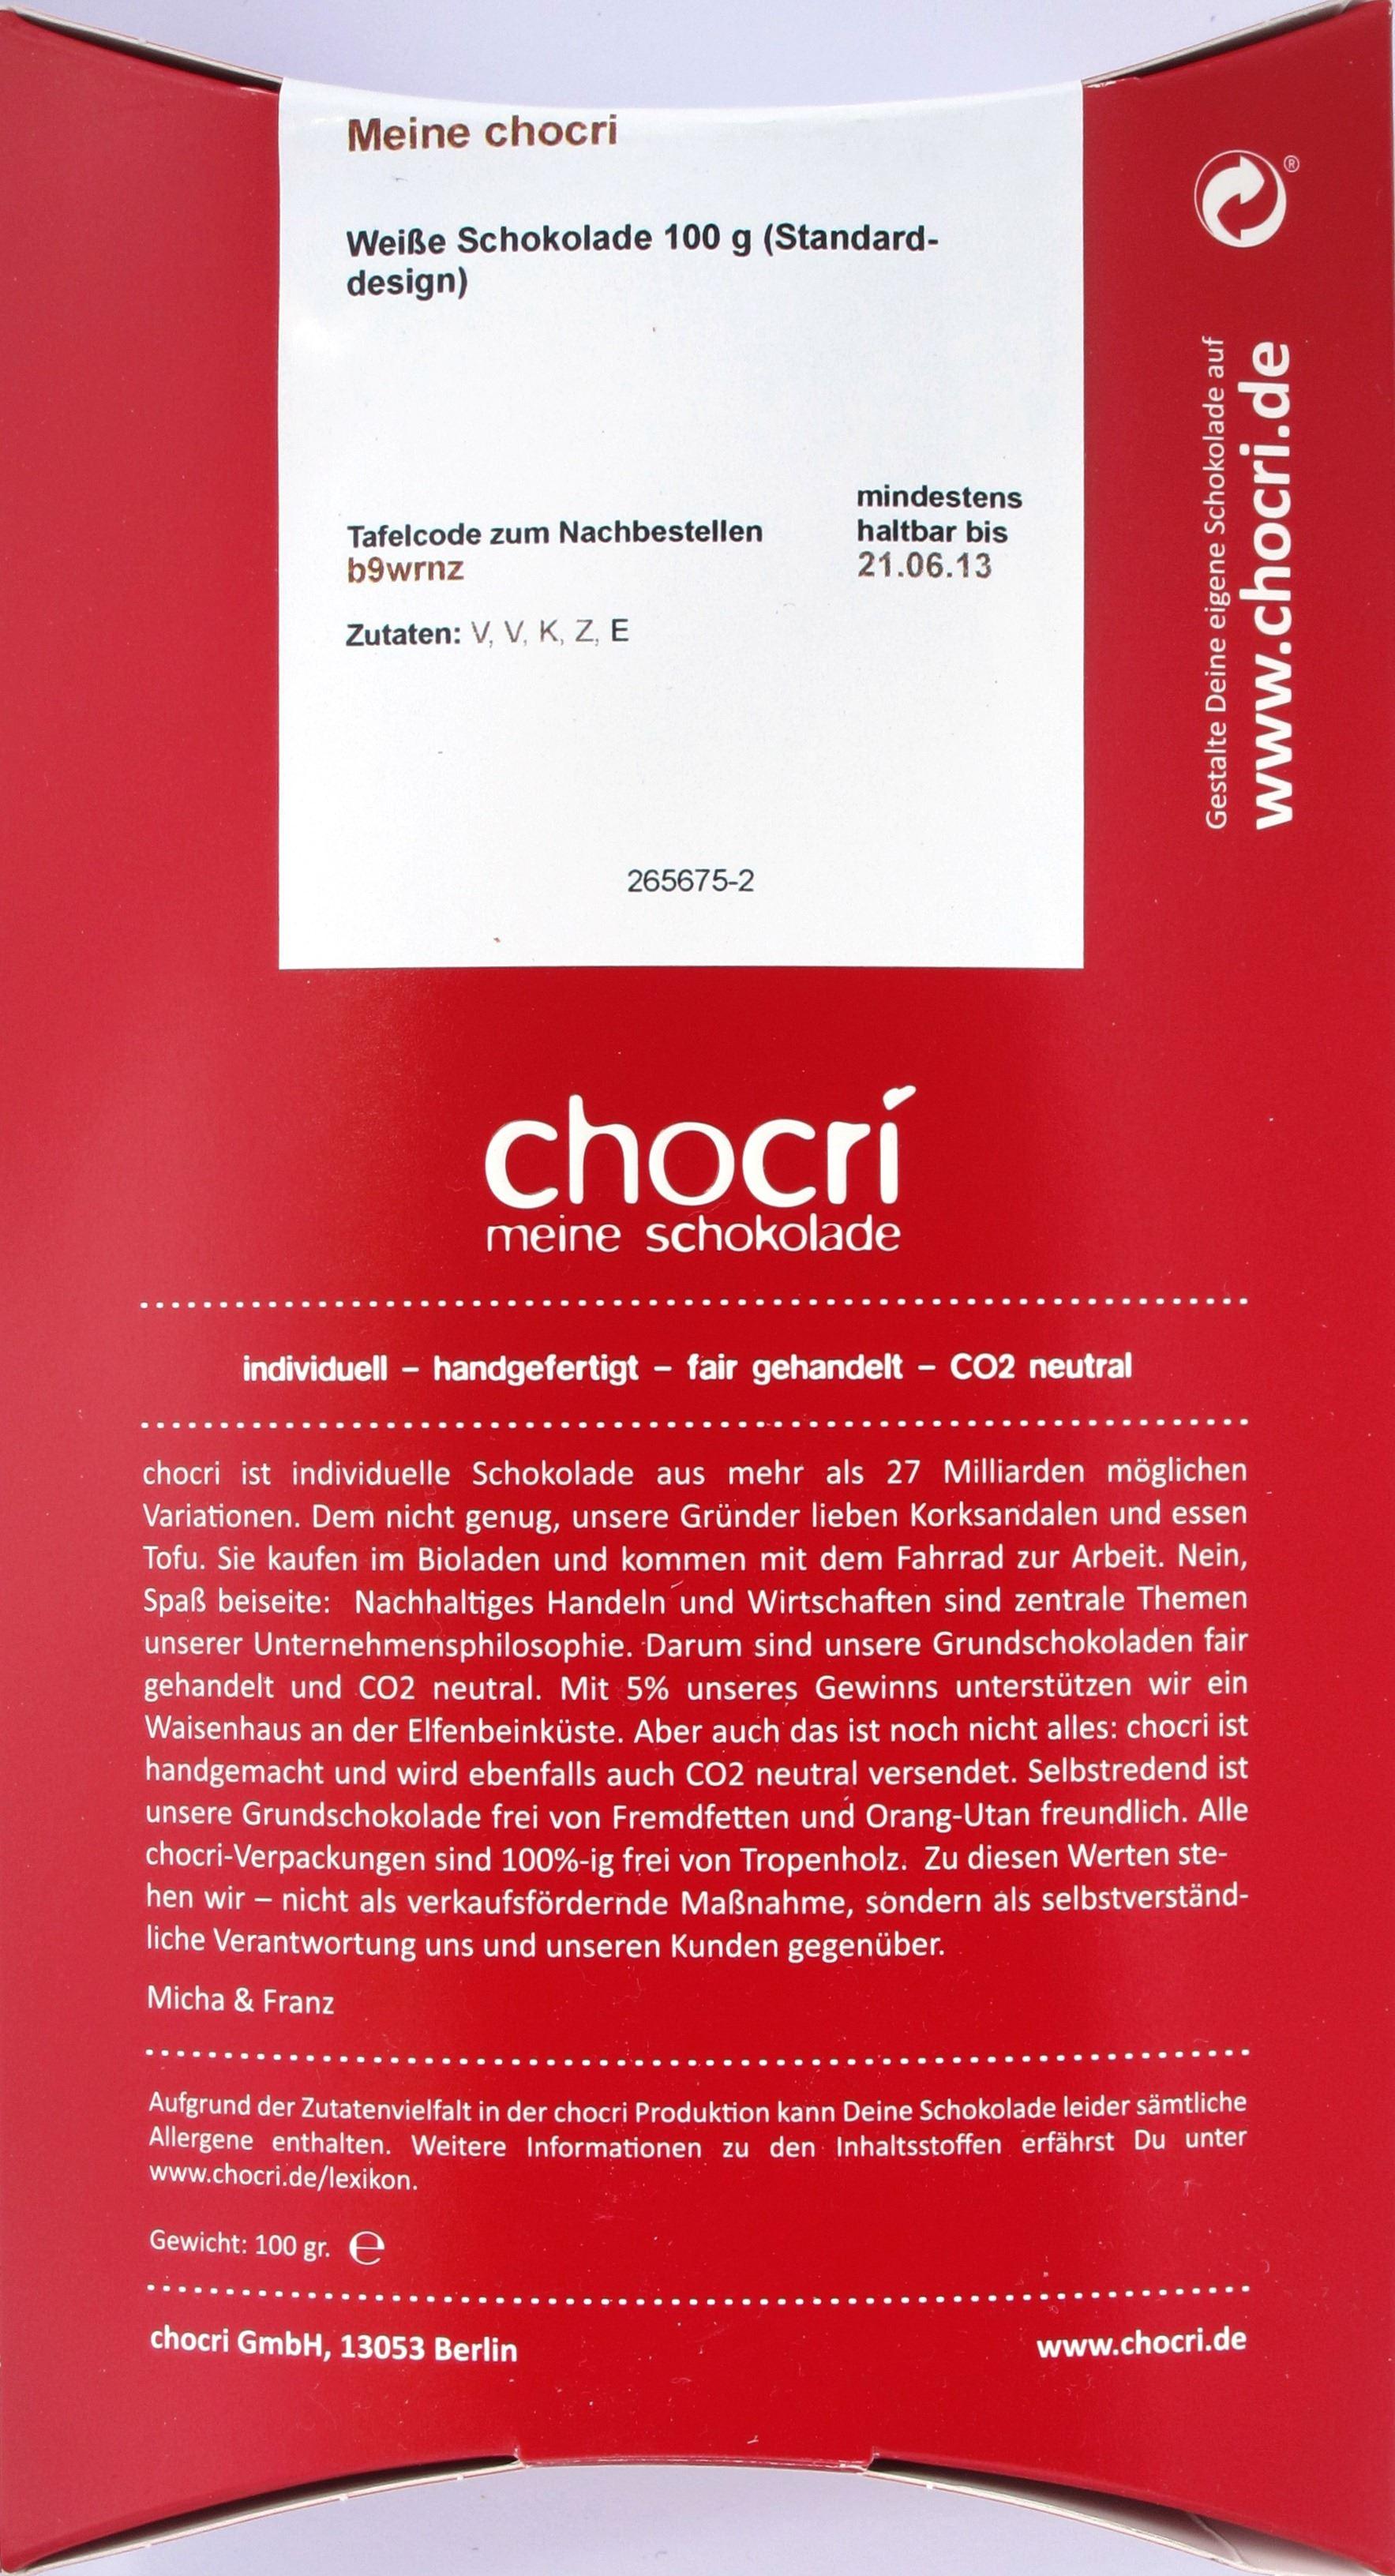 Chocri: individualisierbare weiße Schokolade (Box-Rückseite)